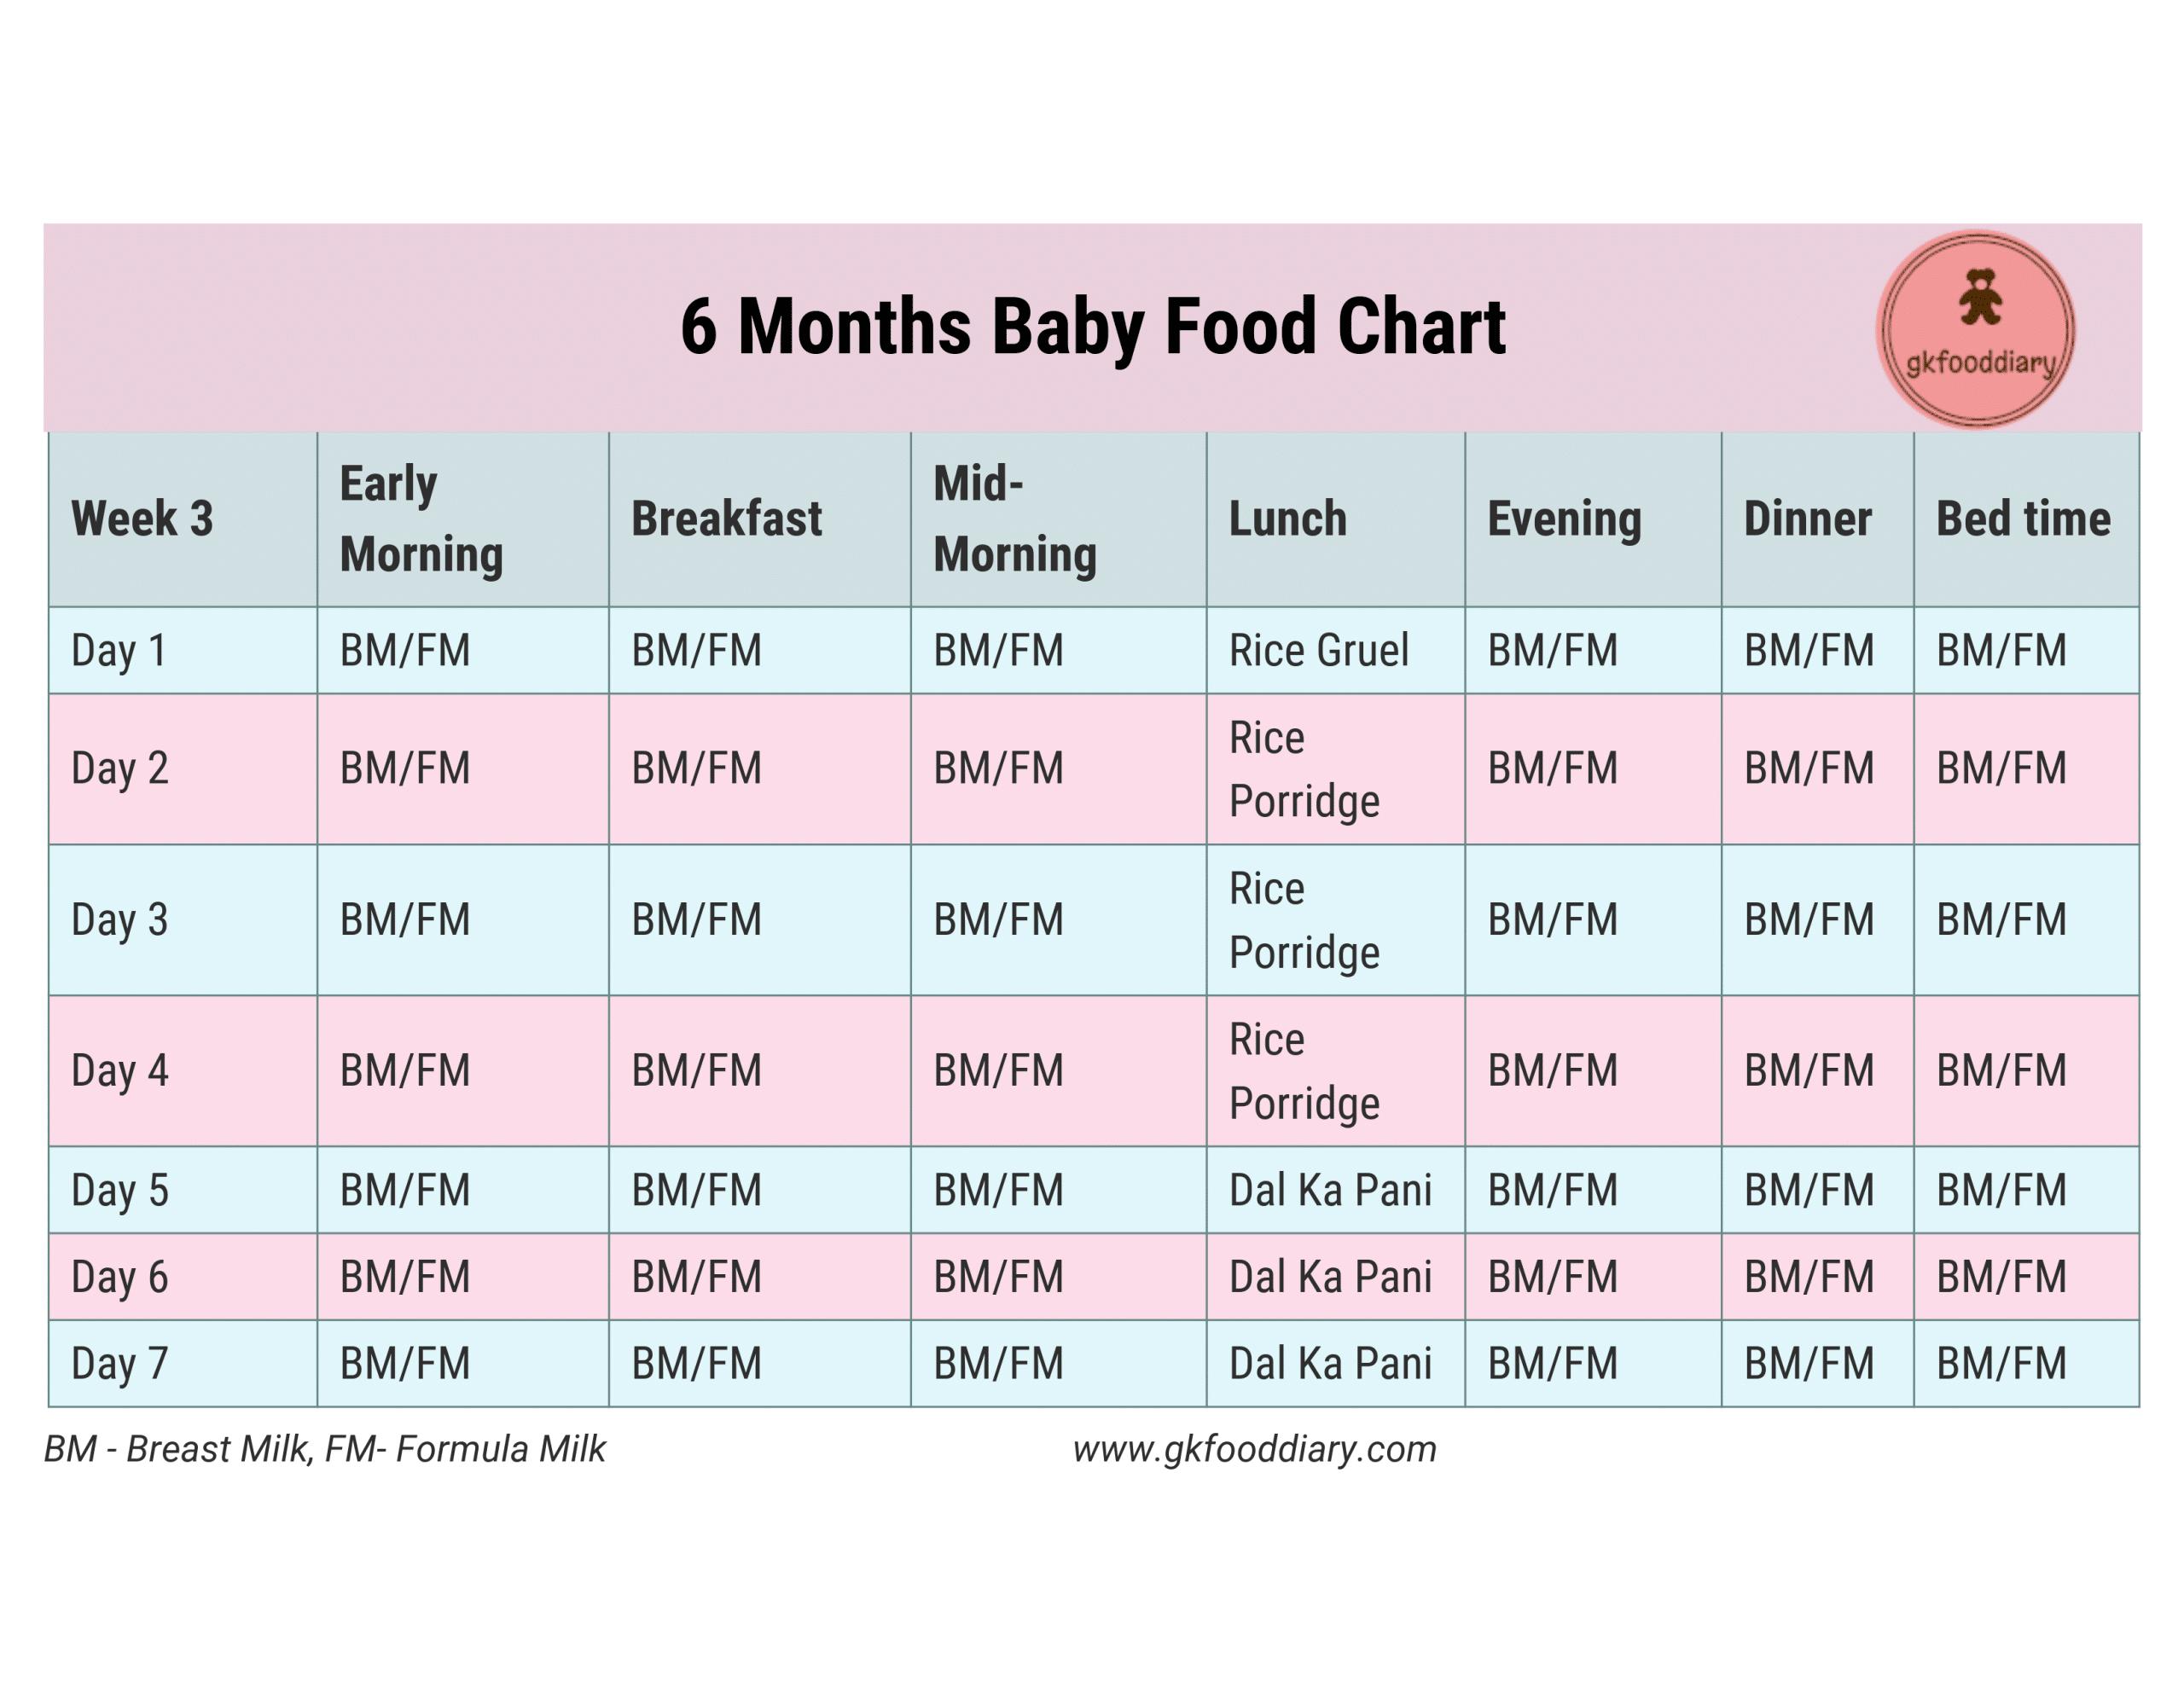 6 Month Baby Food Chart Week 3 - GKFoodDiary - Homemade ...